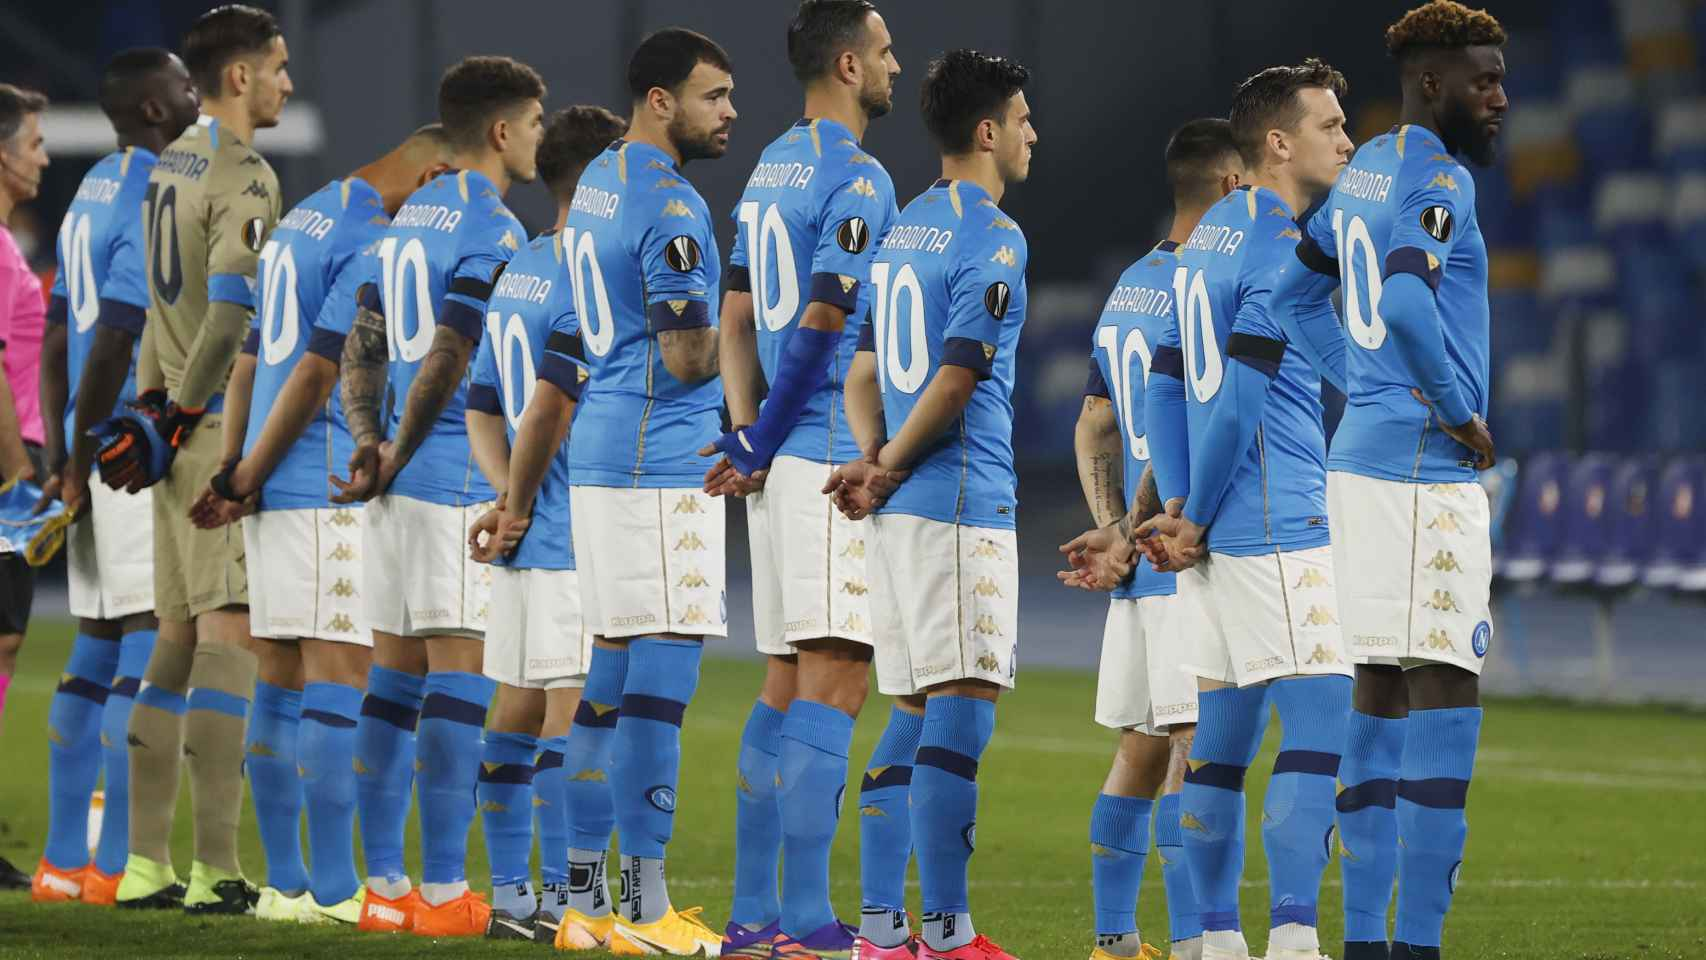 La plantilla del Nápoles homenaje a Maradona